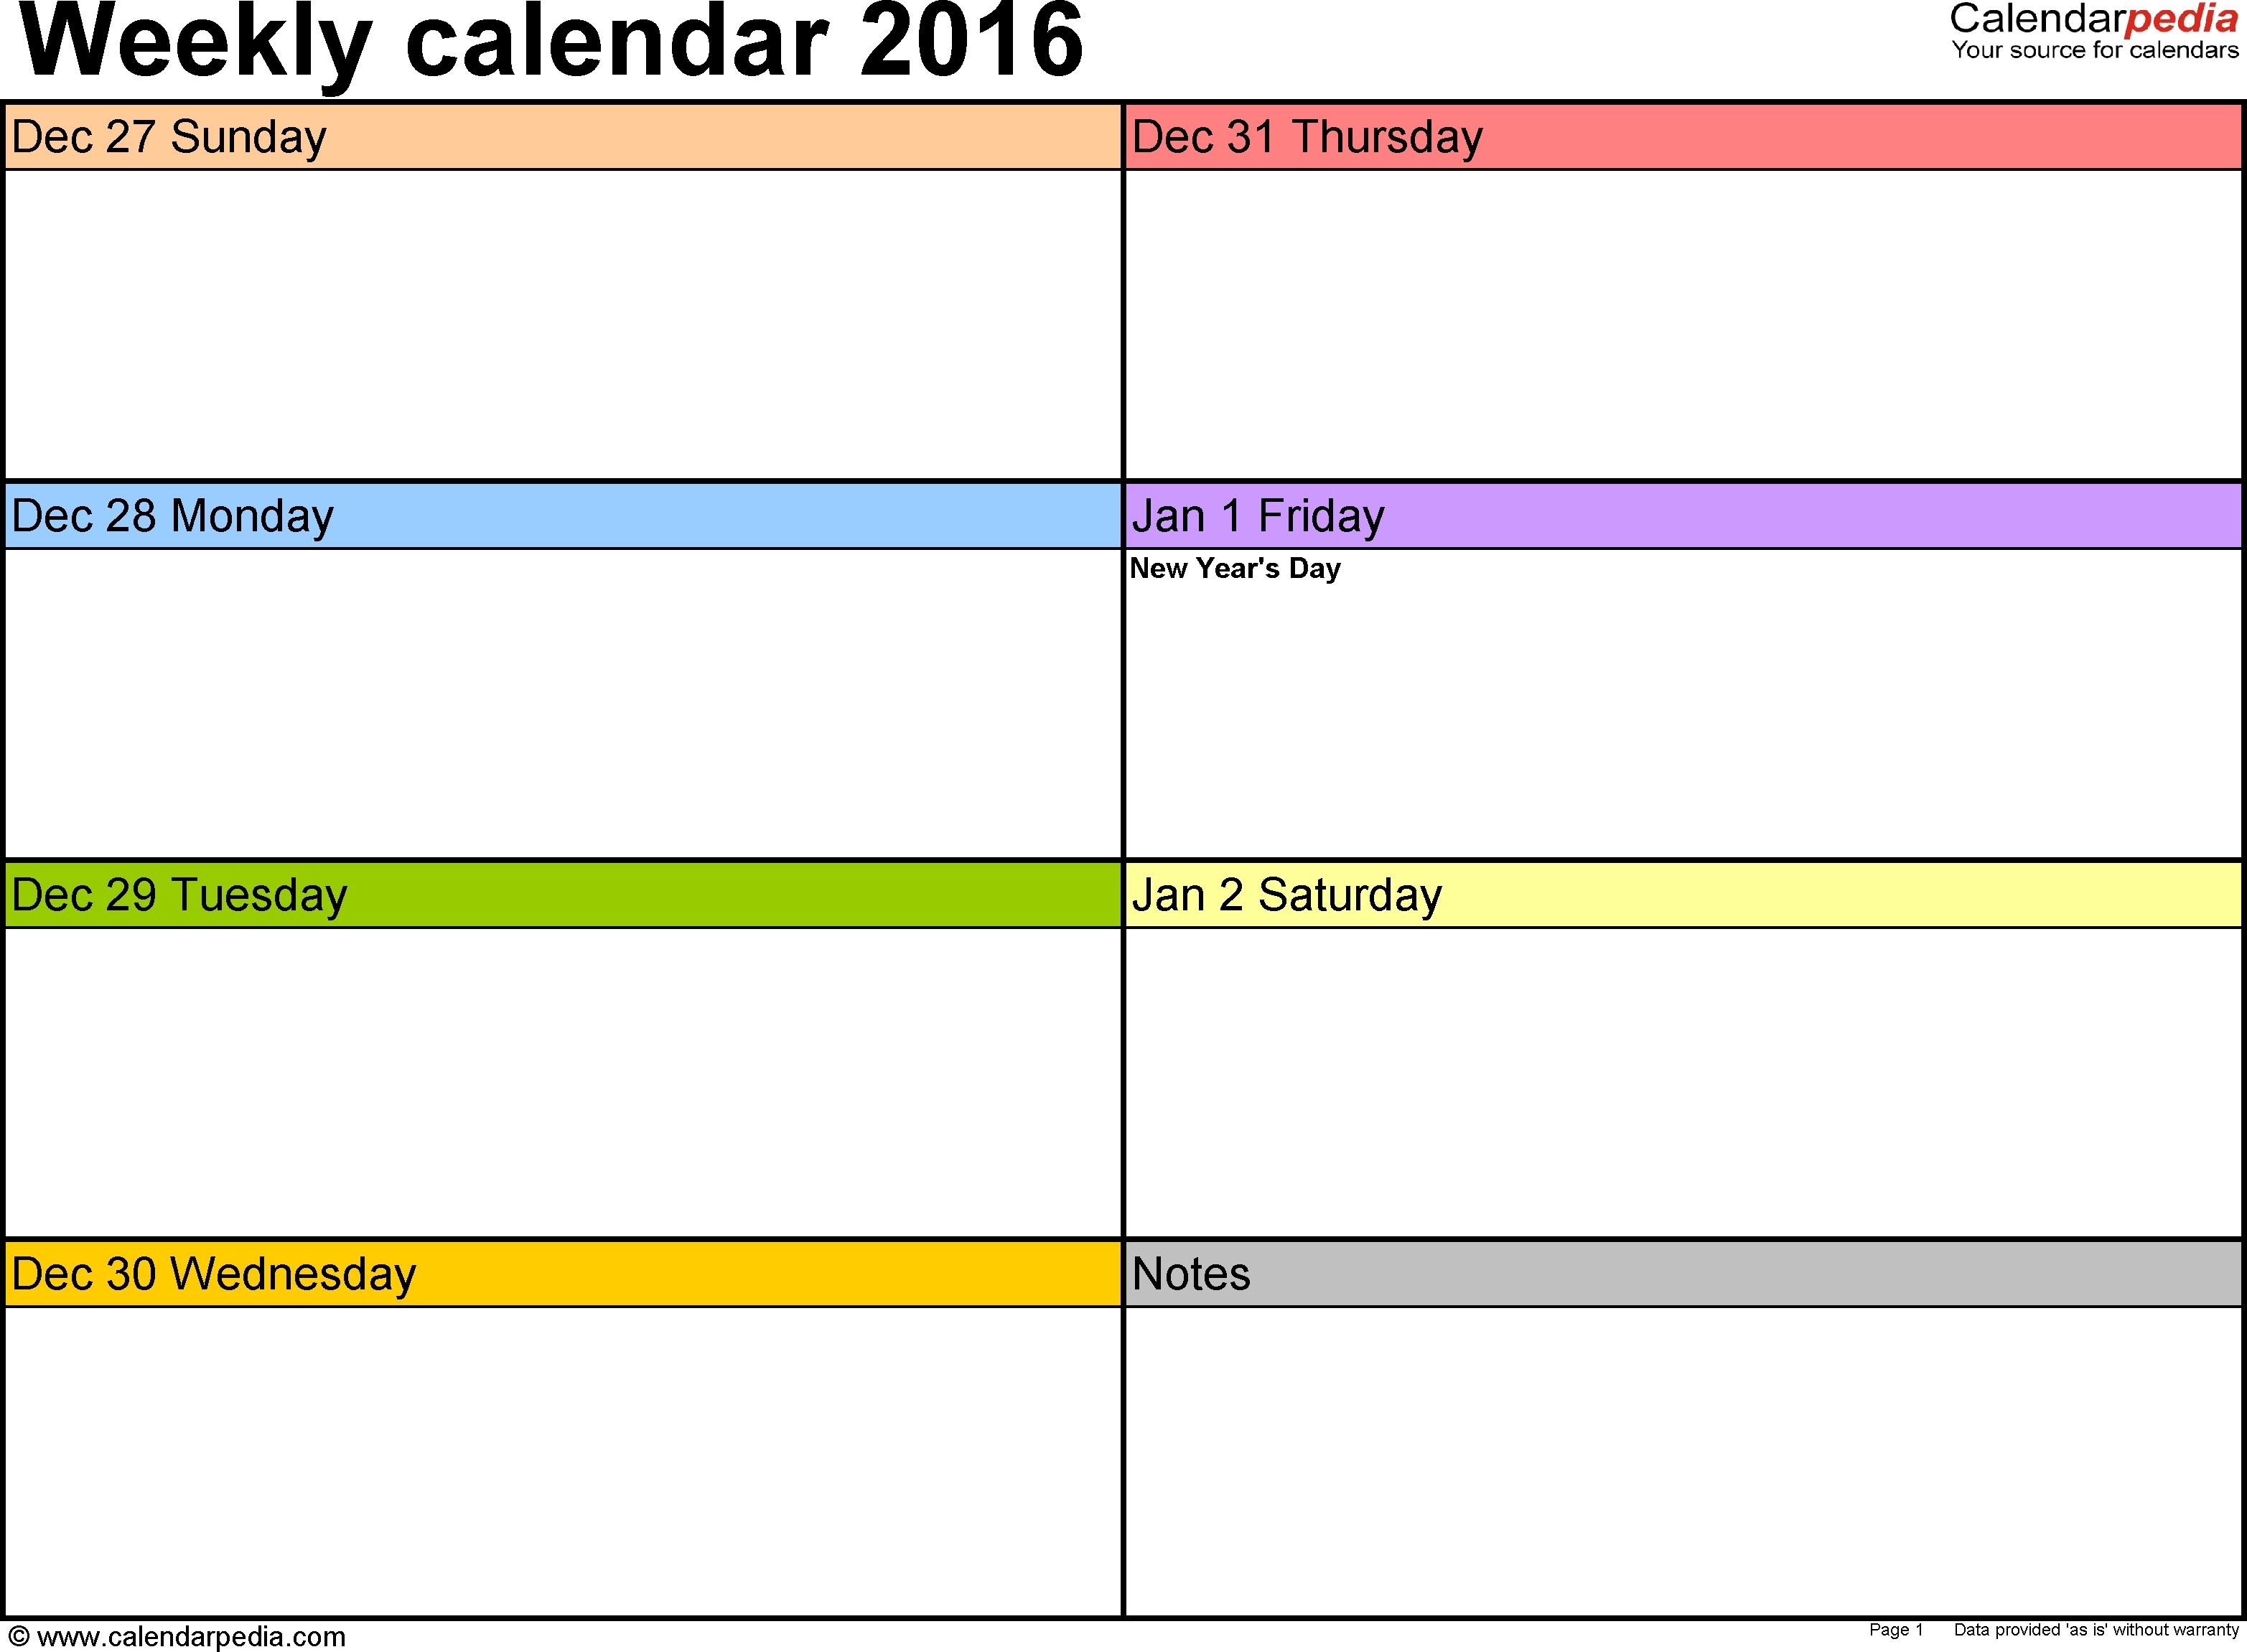 Printable Blank Weekly Calendars Templates - Radiodignidad in Blank Weekly Calendar With Time Slots